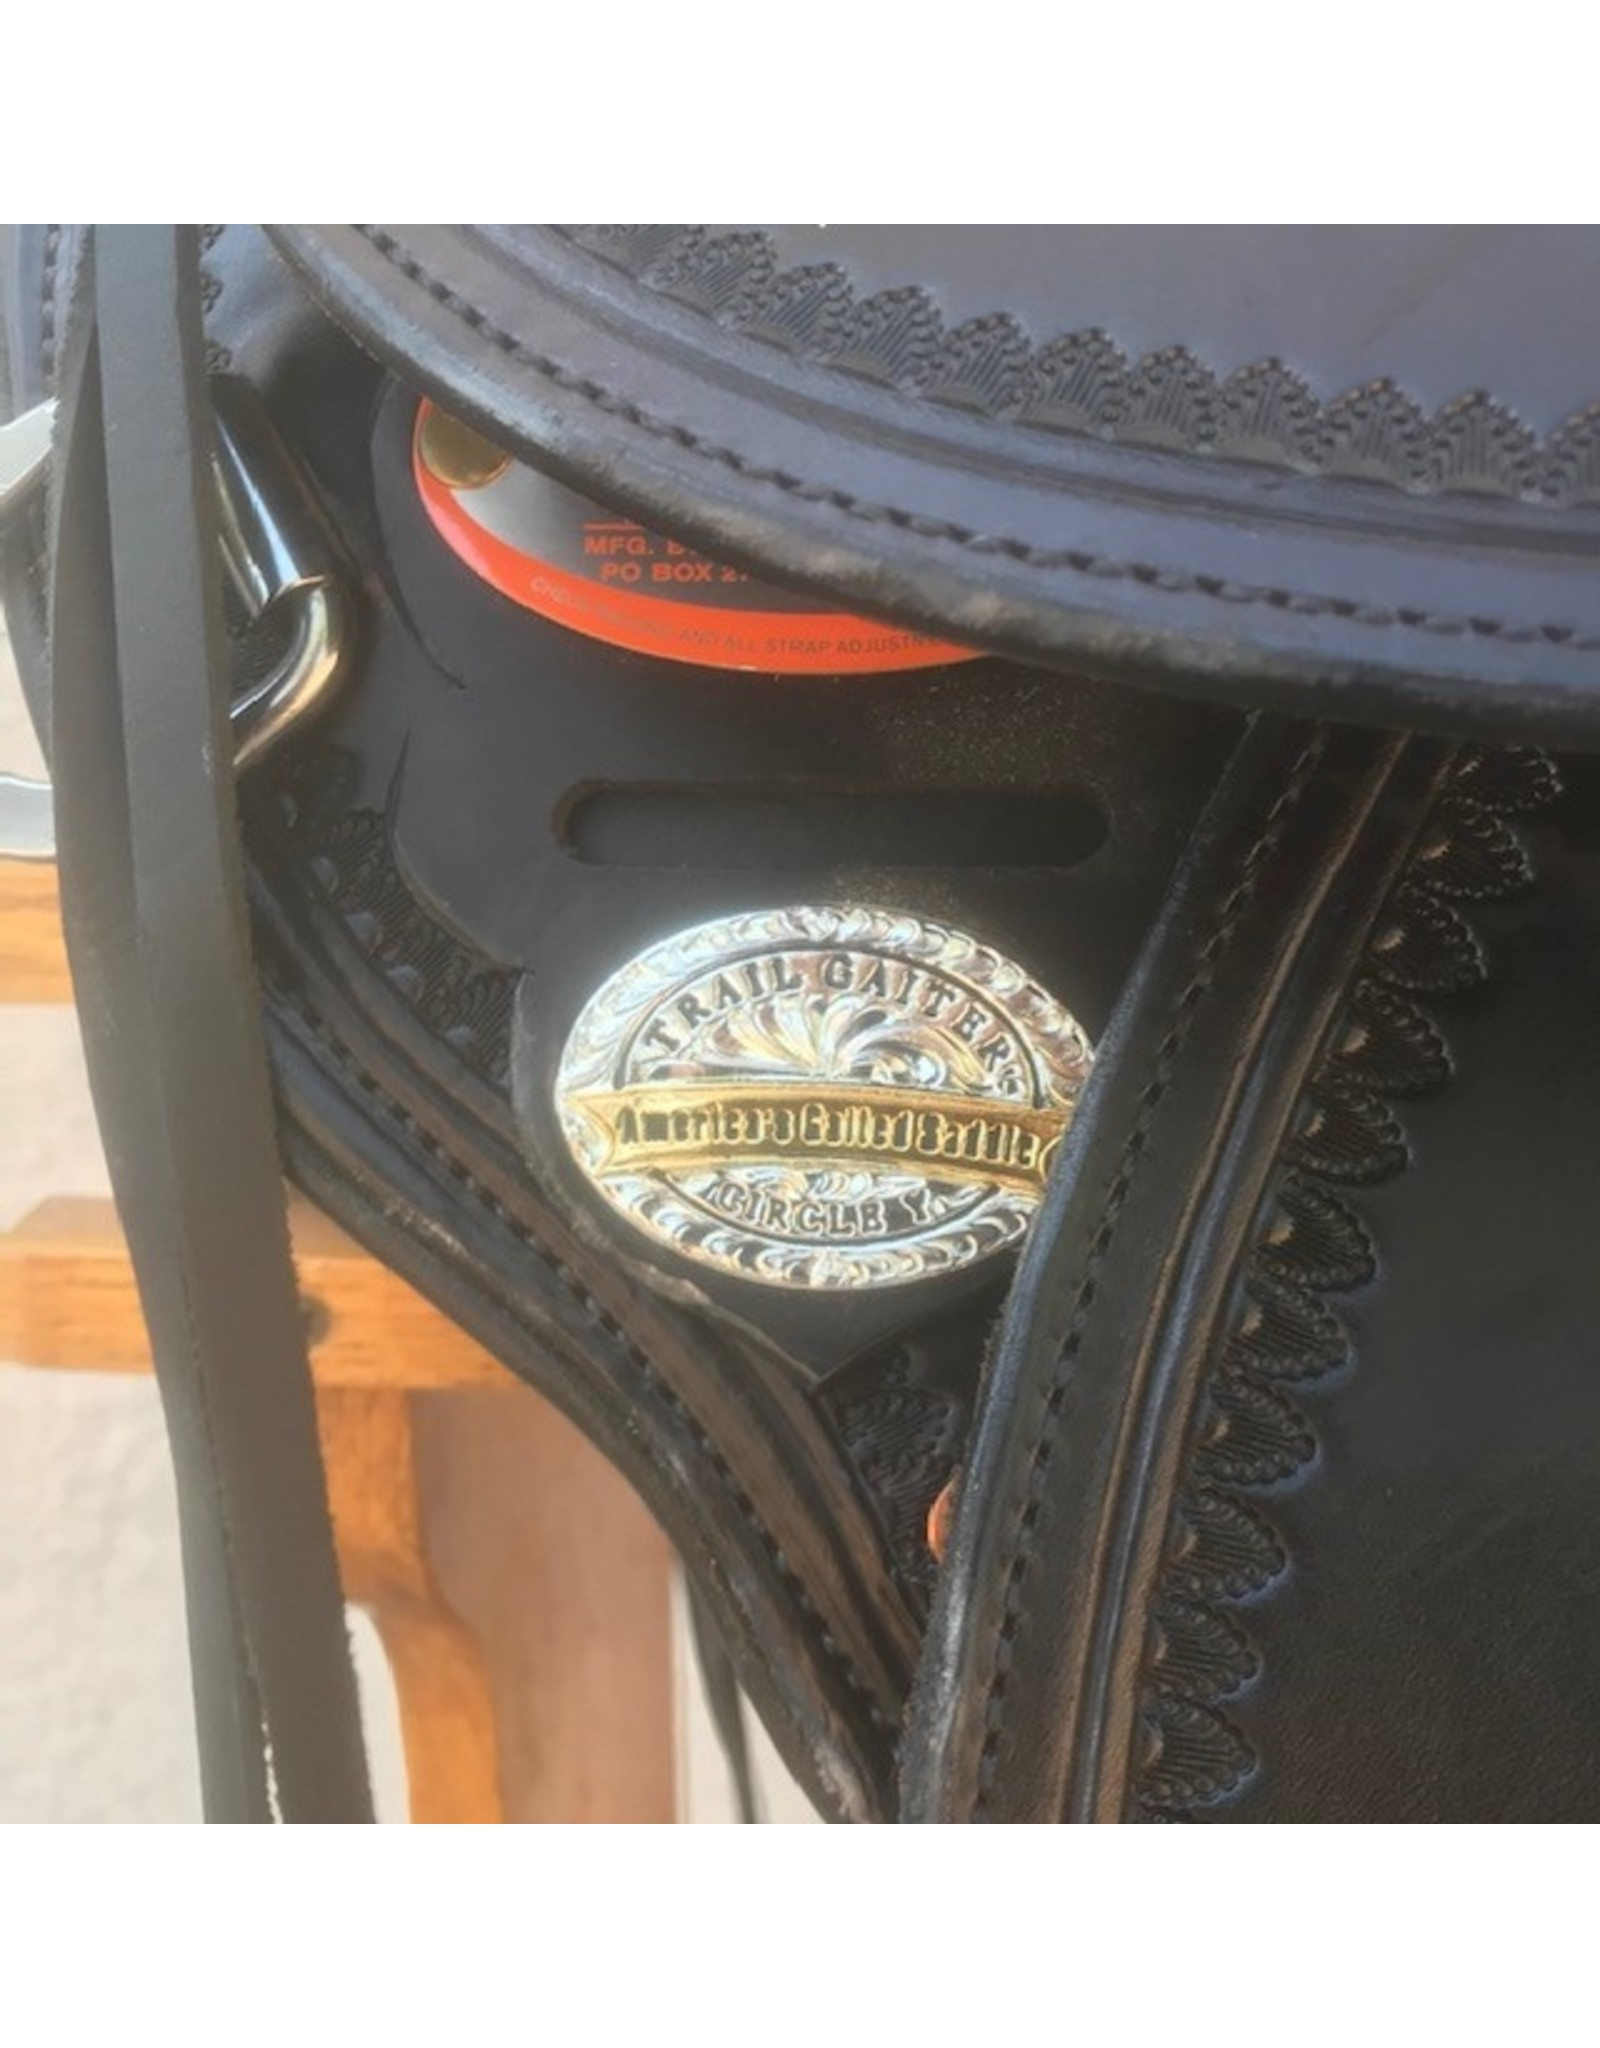 "Circle Y Virginia trail Gaiter Endurance 16"" Wide Gaited"